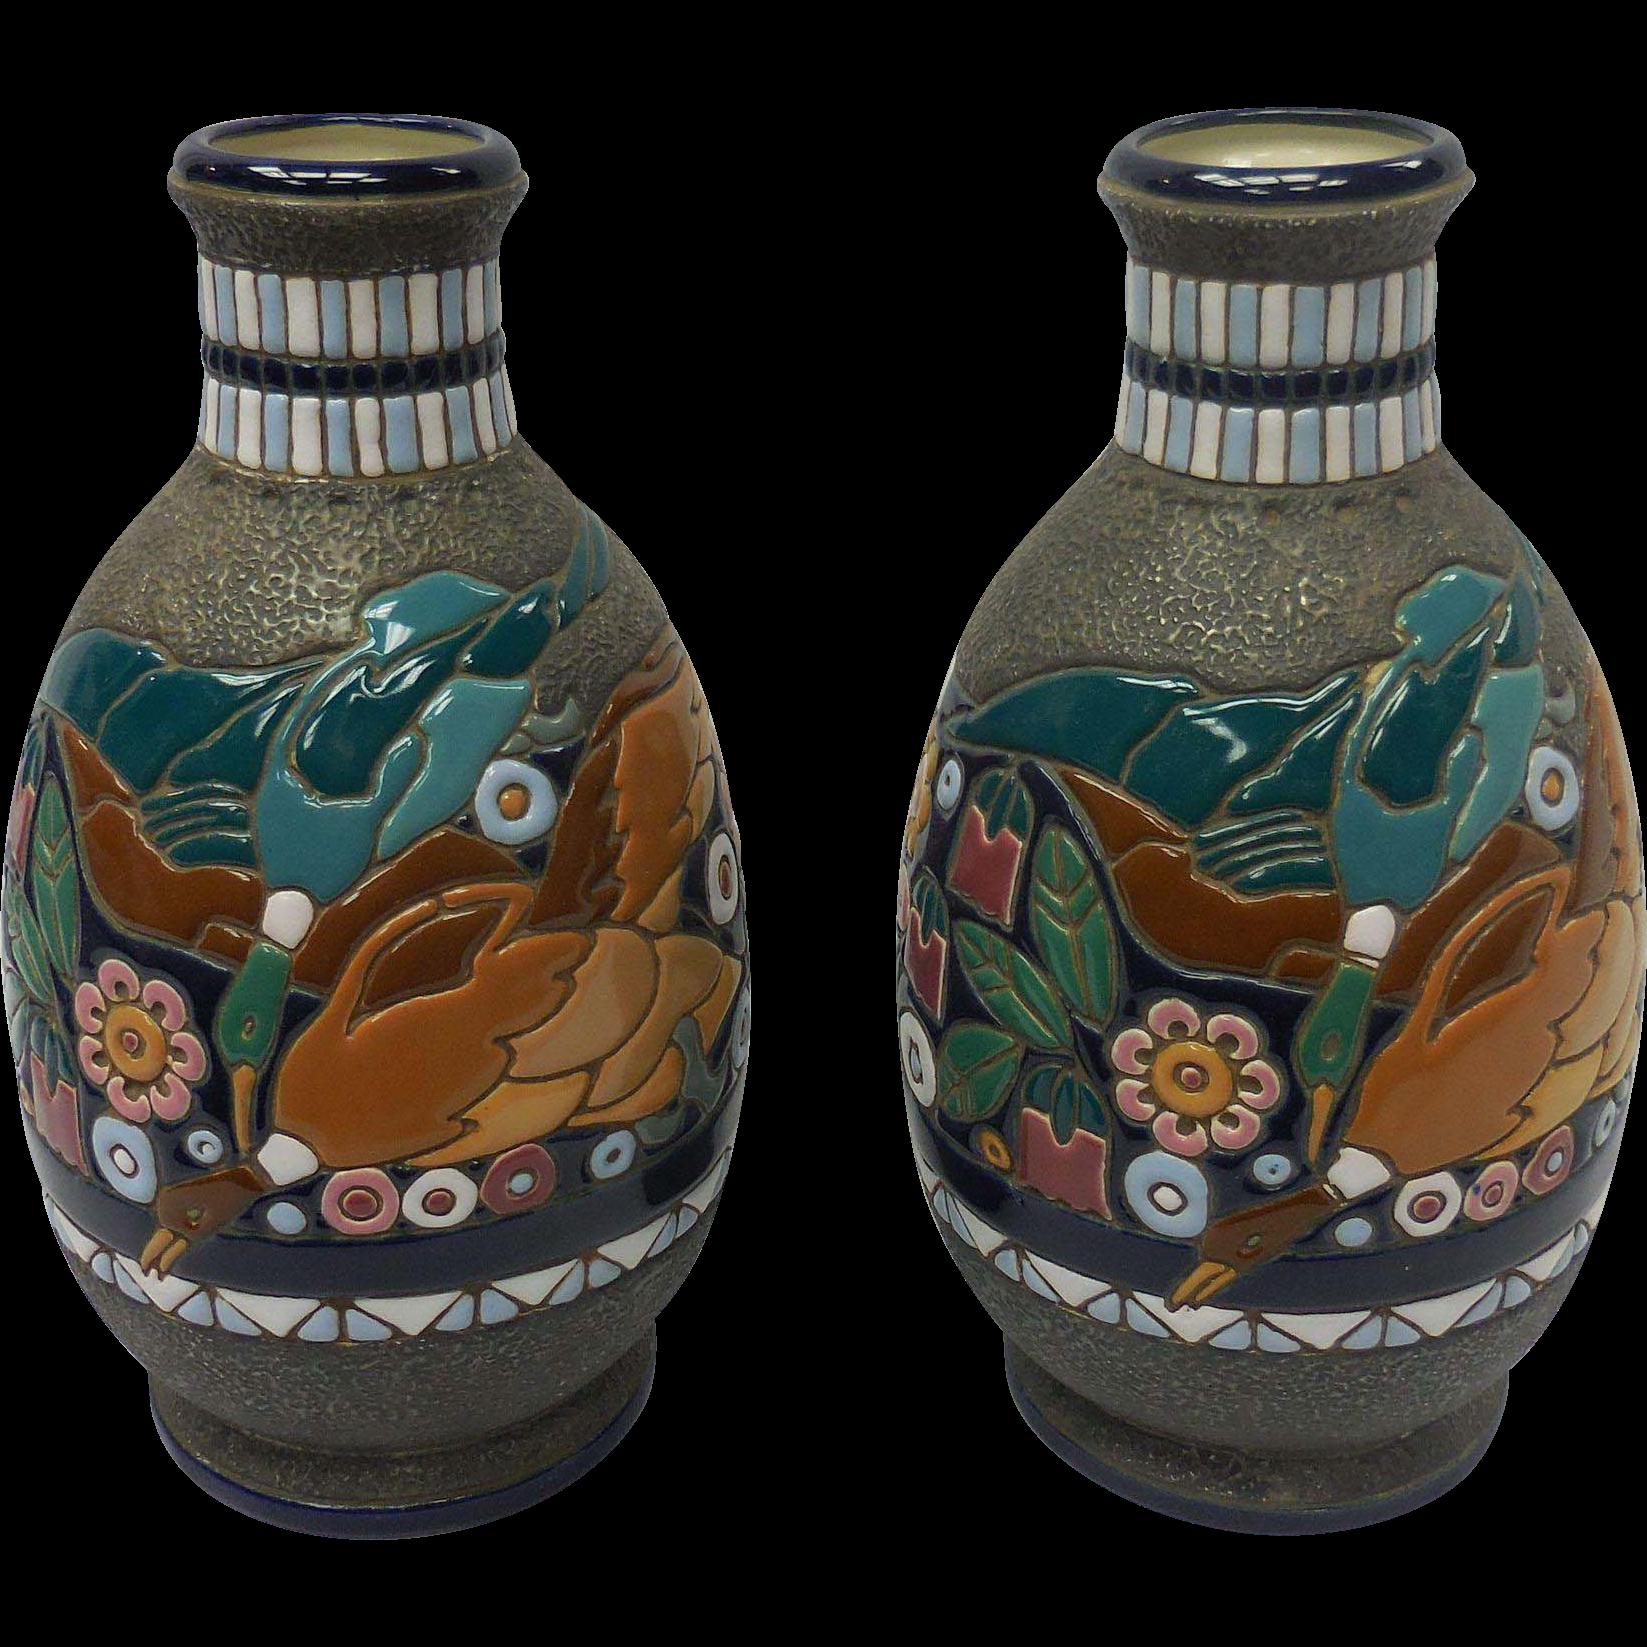 pair of art nouveau amphora ceramic vase with duck motif